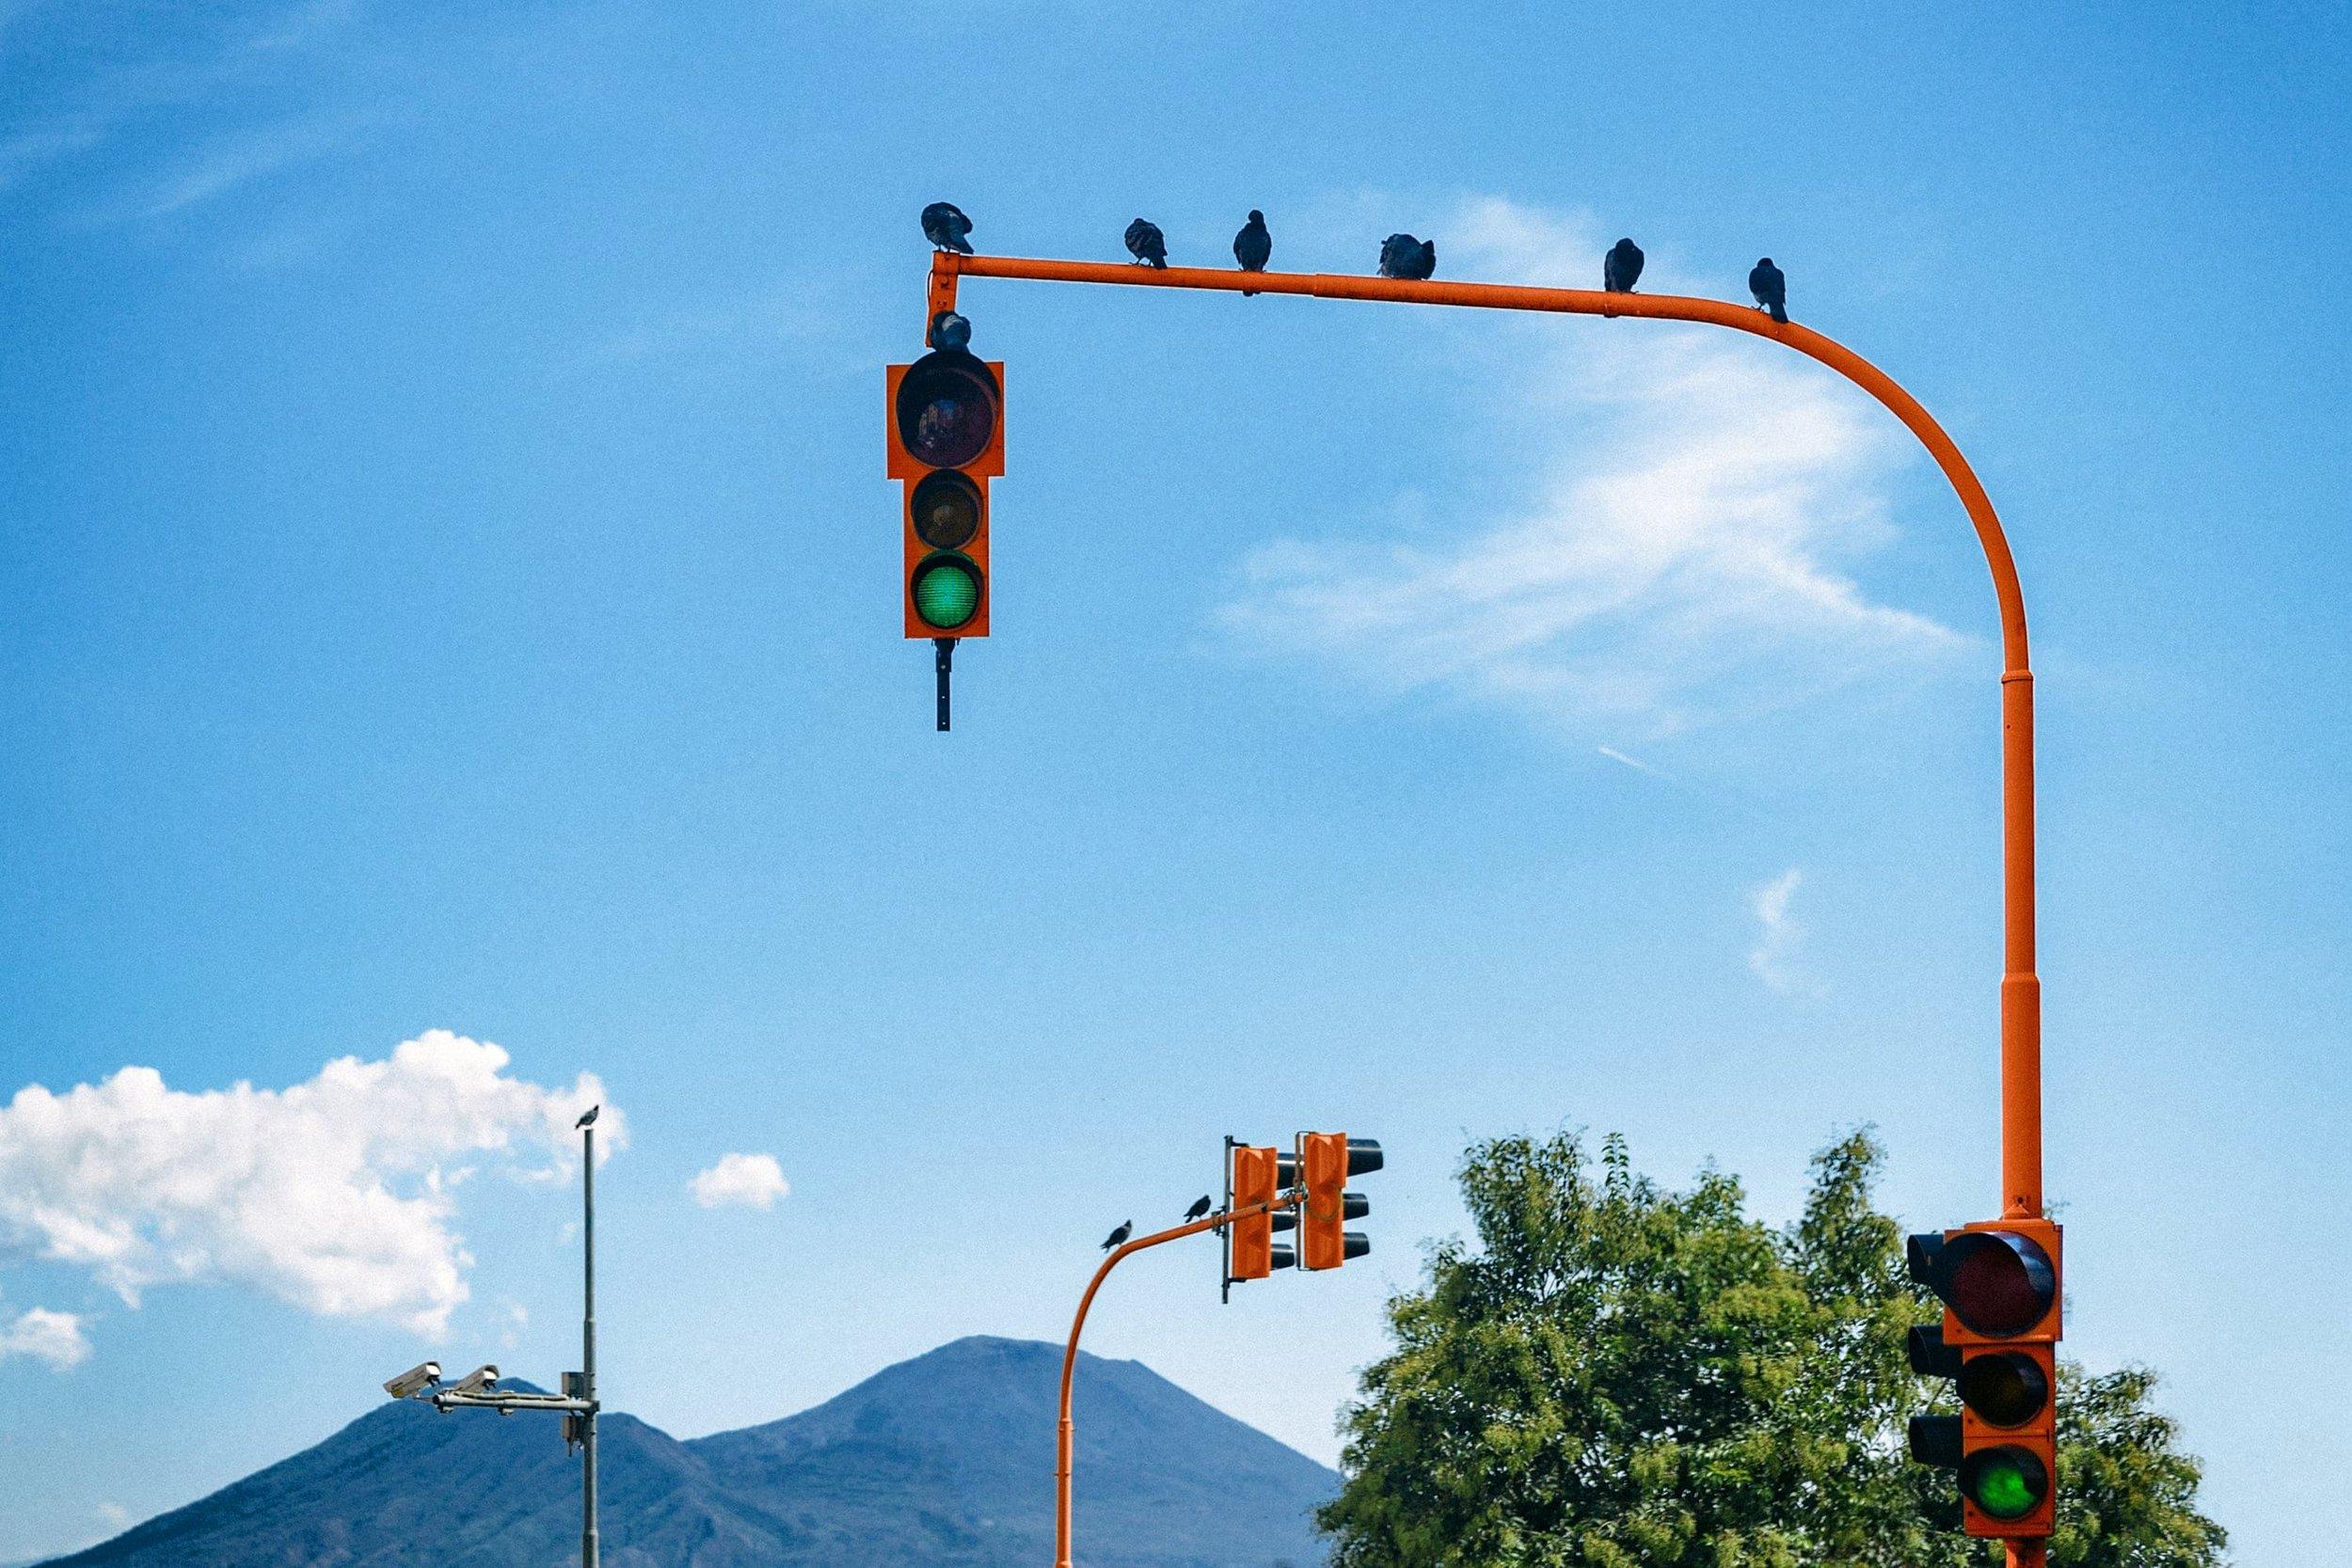 street-documentary-photography-fabio-burrelli-6.jpg